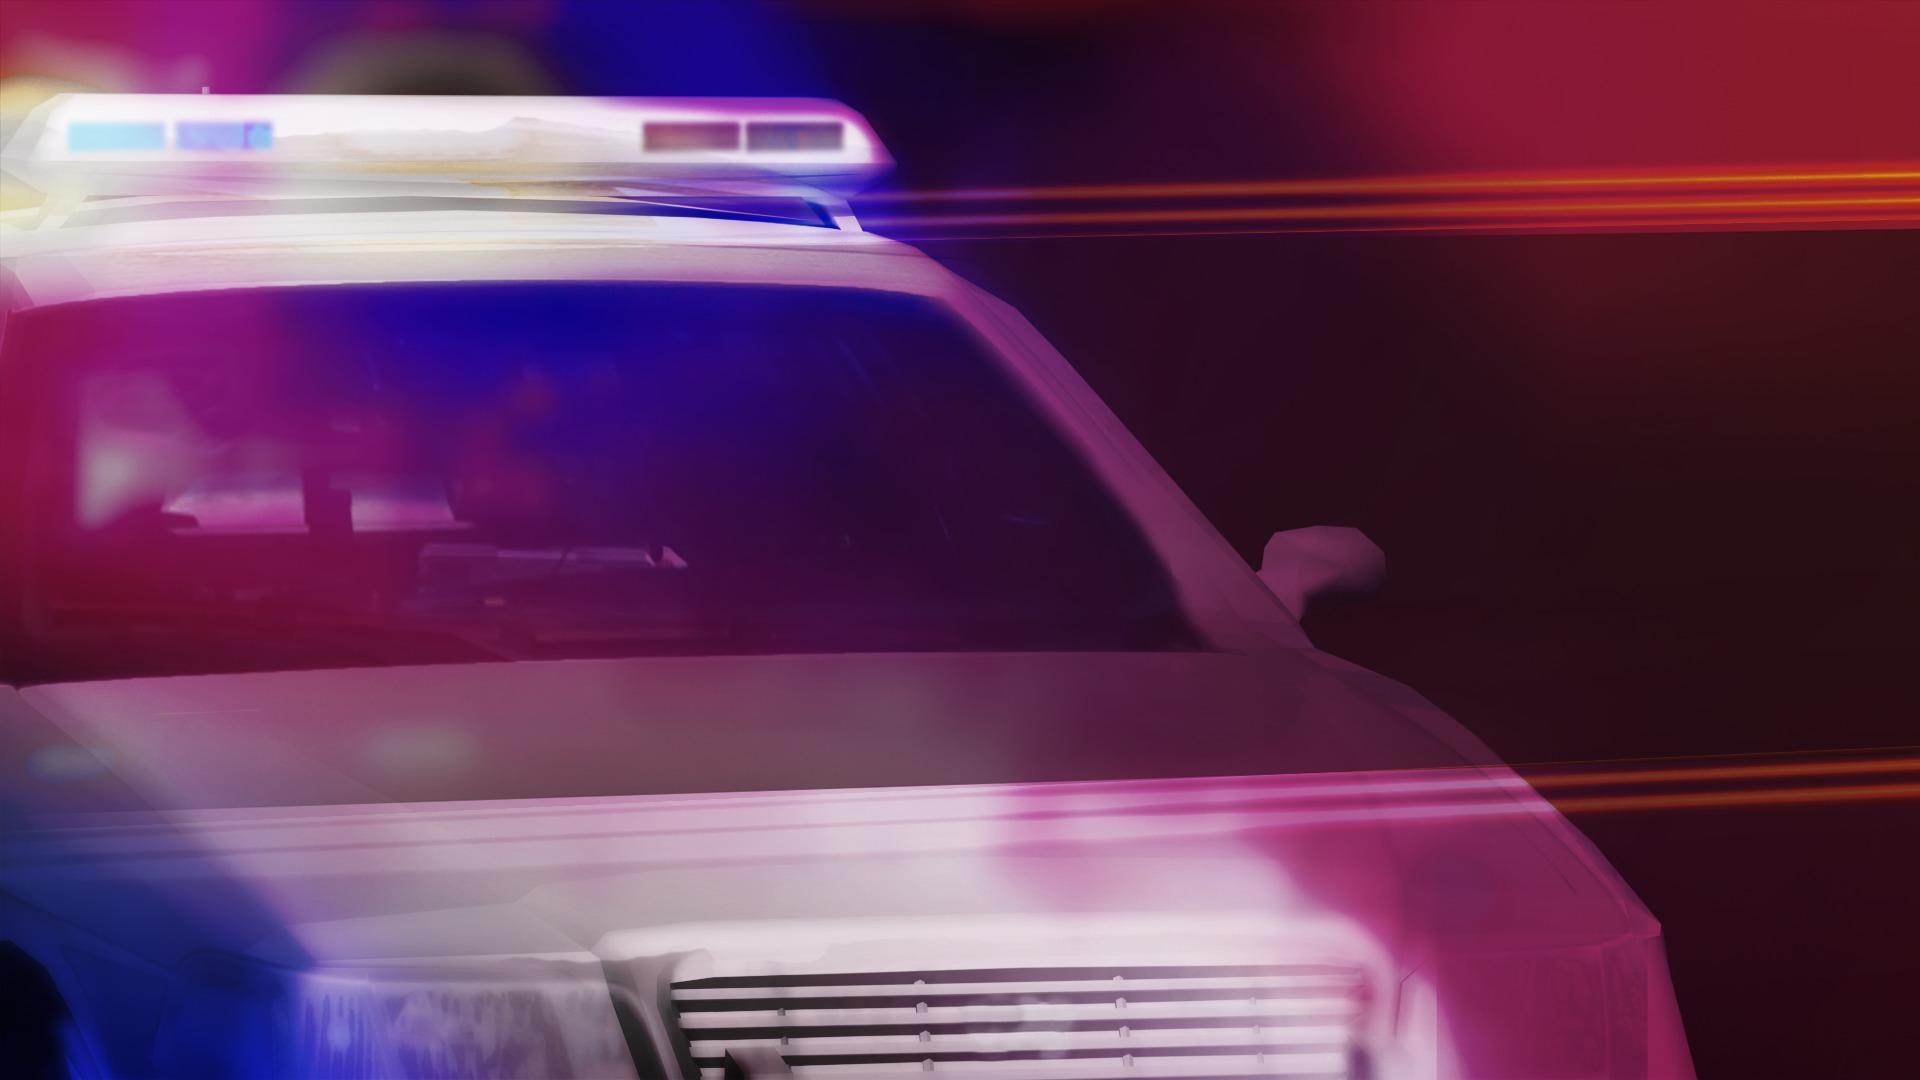 57-Year-Old Woman Dies in Eufaula Crash